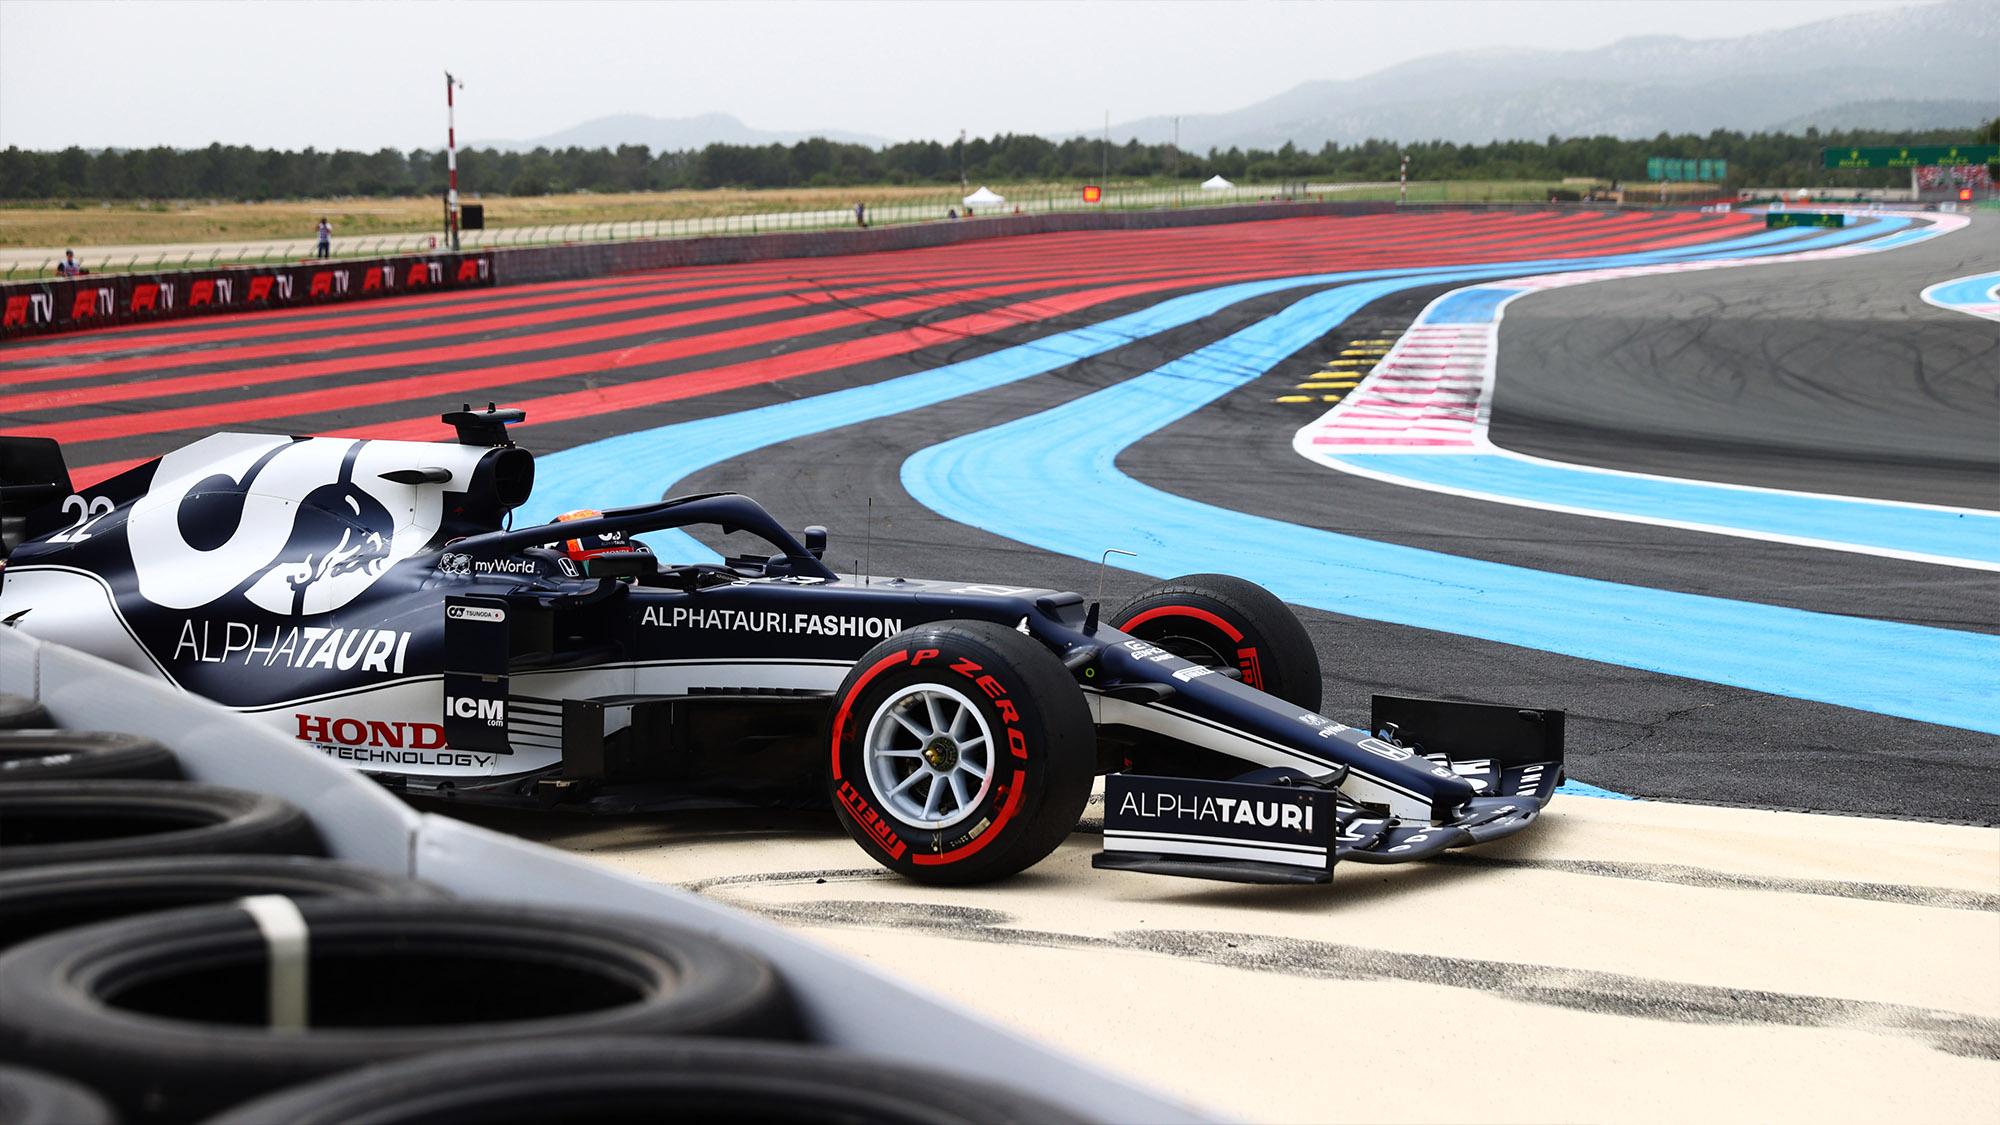 Yuki Tsunoda crashes during qualifying for the 2021 French Grand Prix